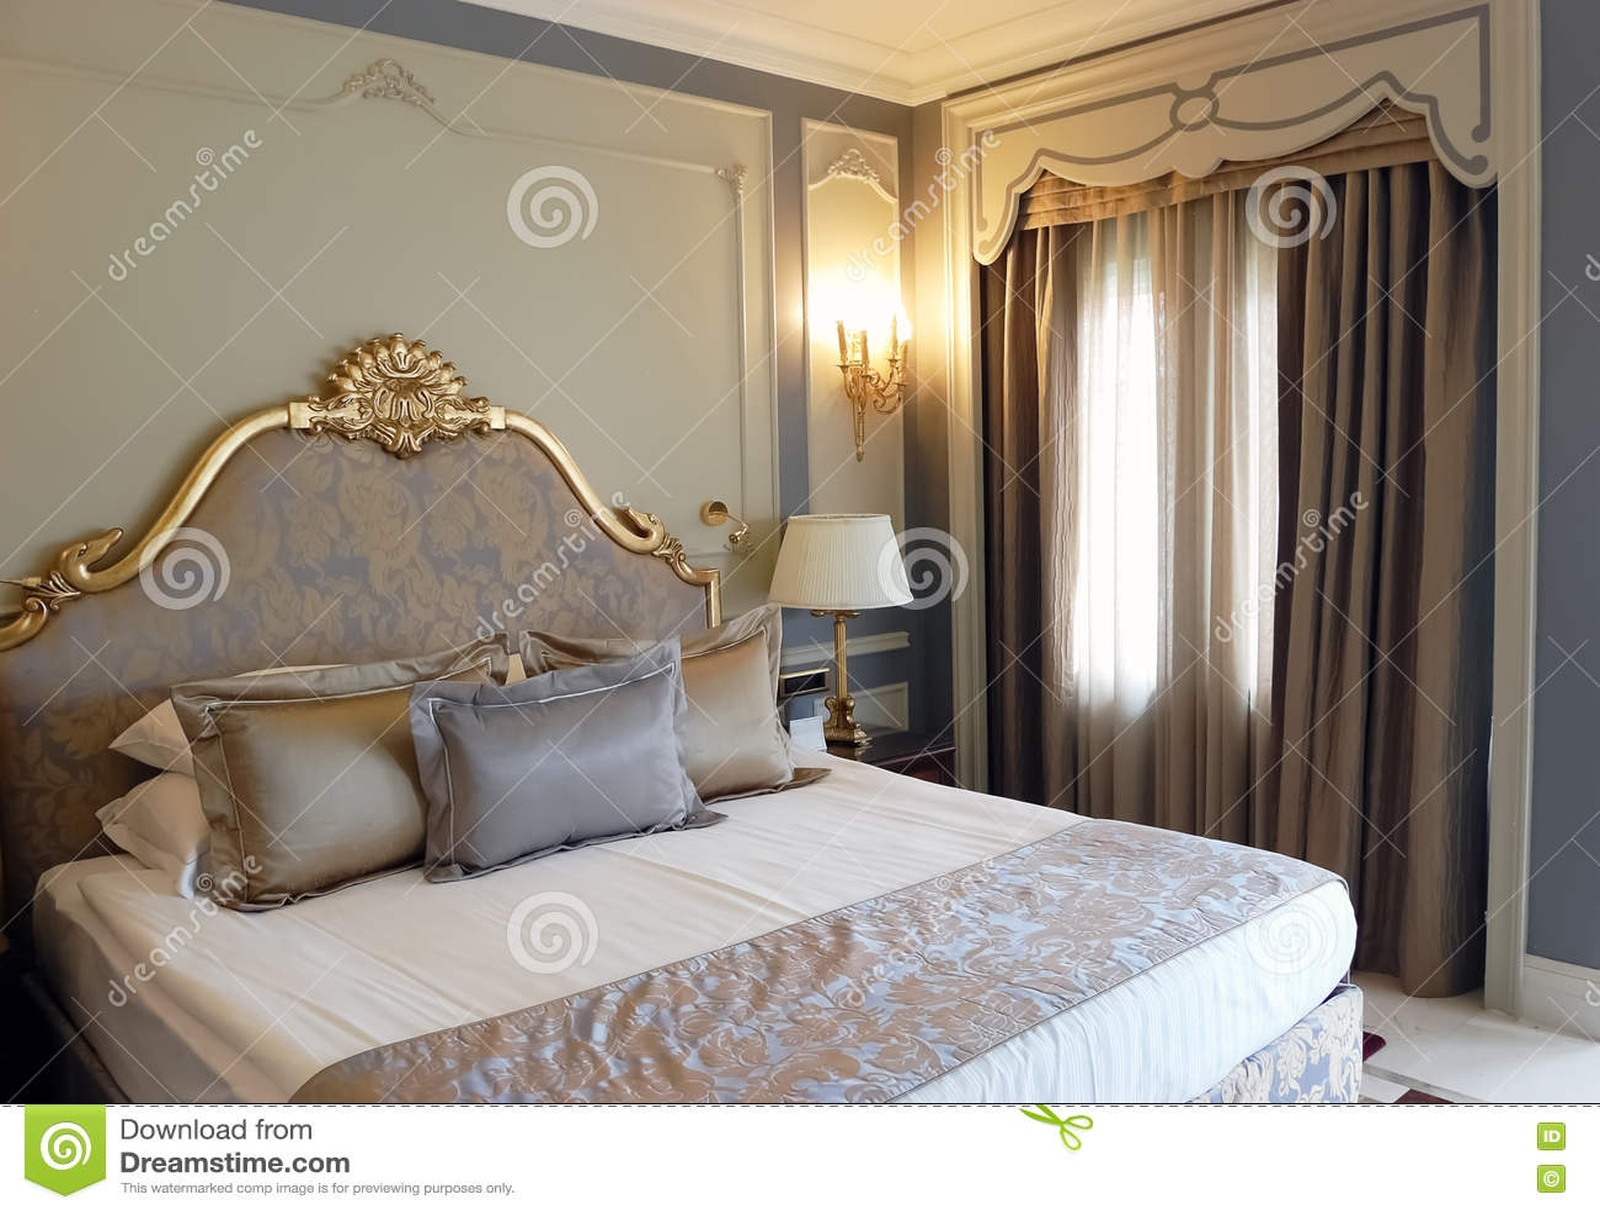 Side, ANTALYA, TURKEY   JUNE 02, 2015: Interior Of Bedroom In Grey Tones In  The High Class Hotel Of Turkey.